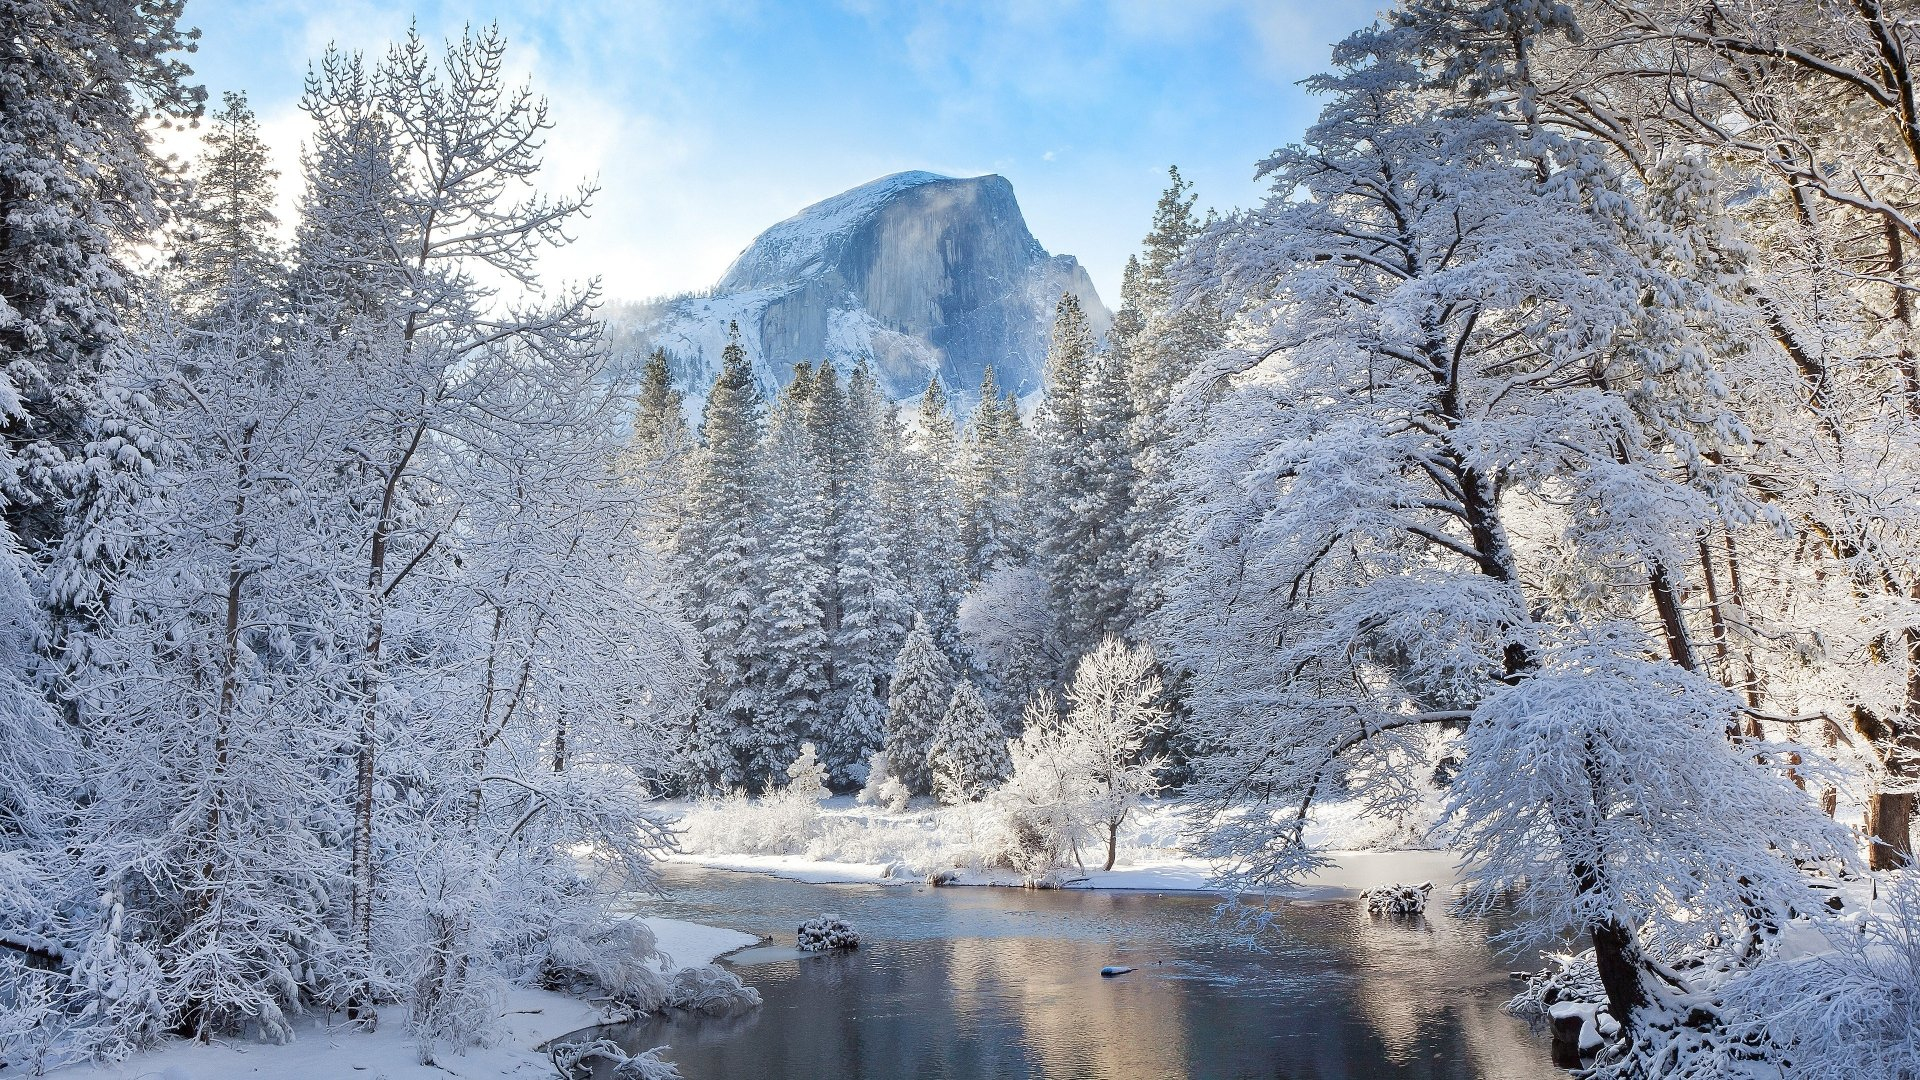 Winter mountain landscape 4k ultra hd wallpaper for Sfondi paesaggi invernali per desktop